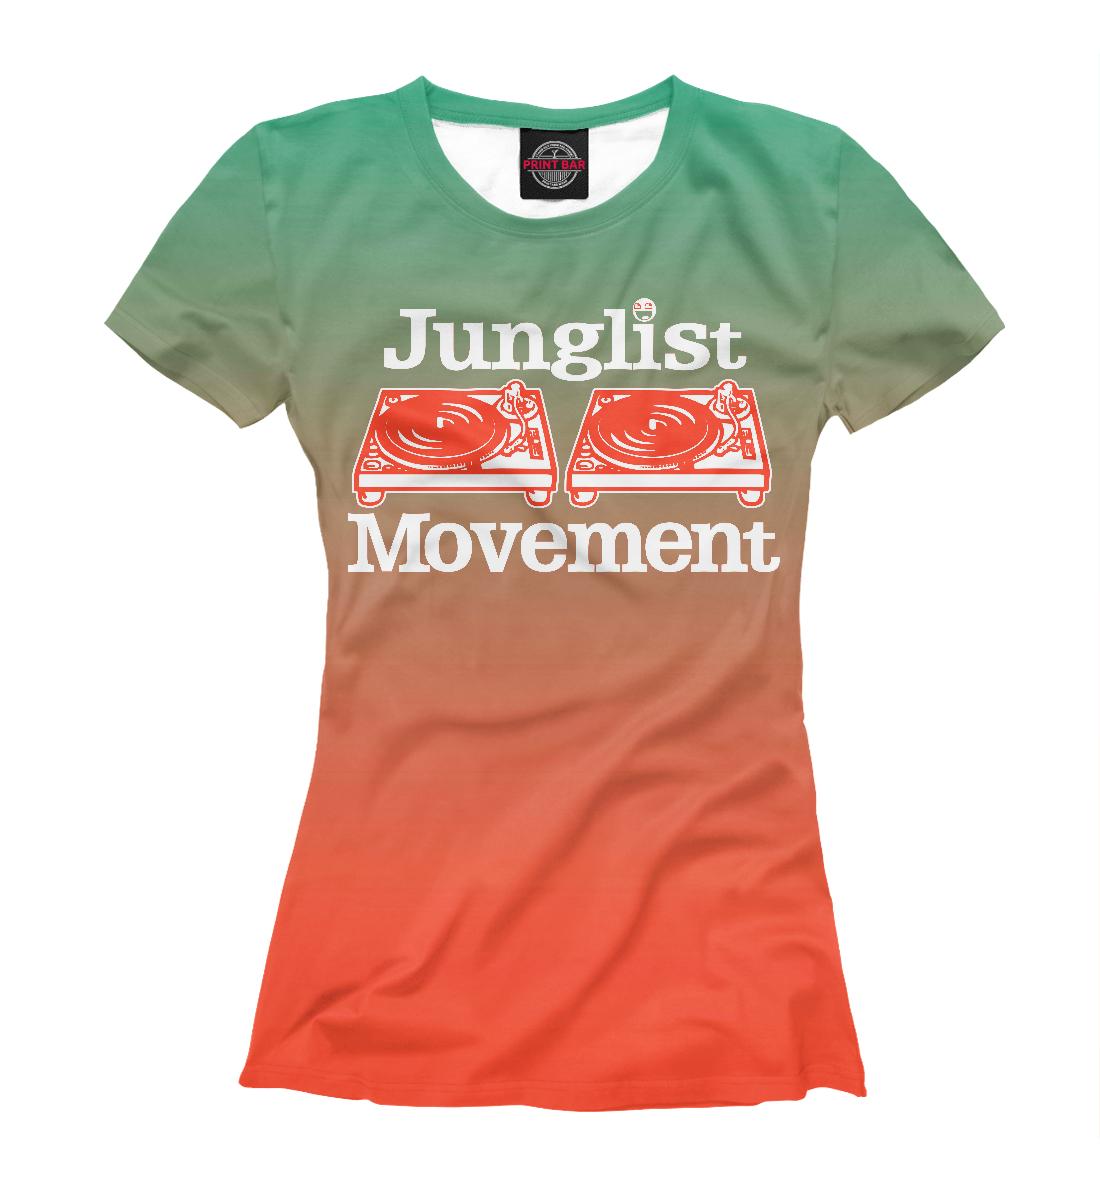 junglist movement Junglist movement